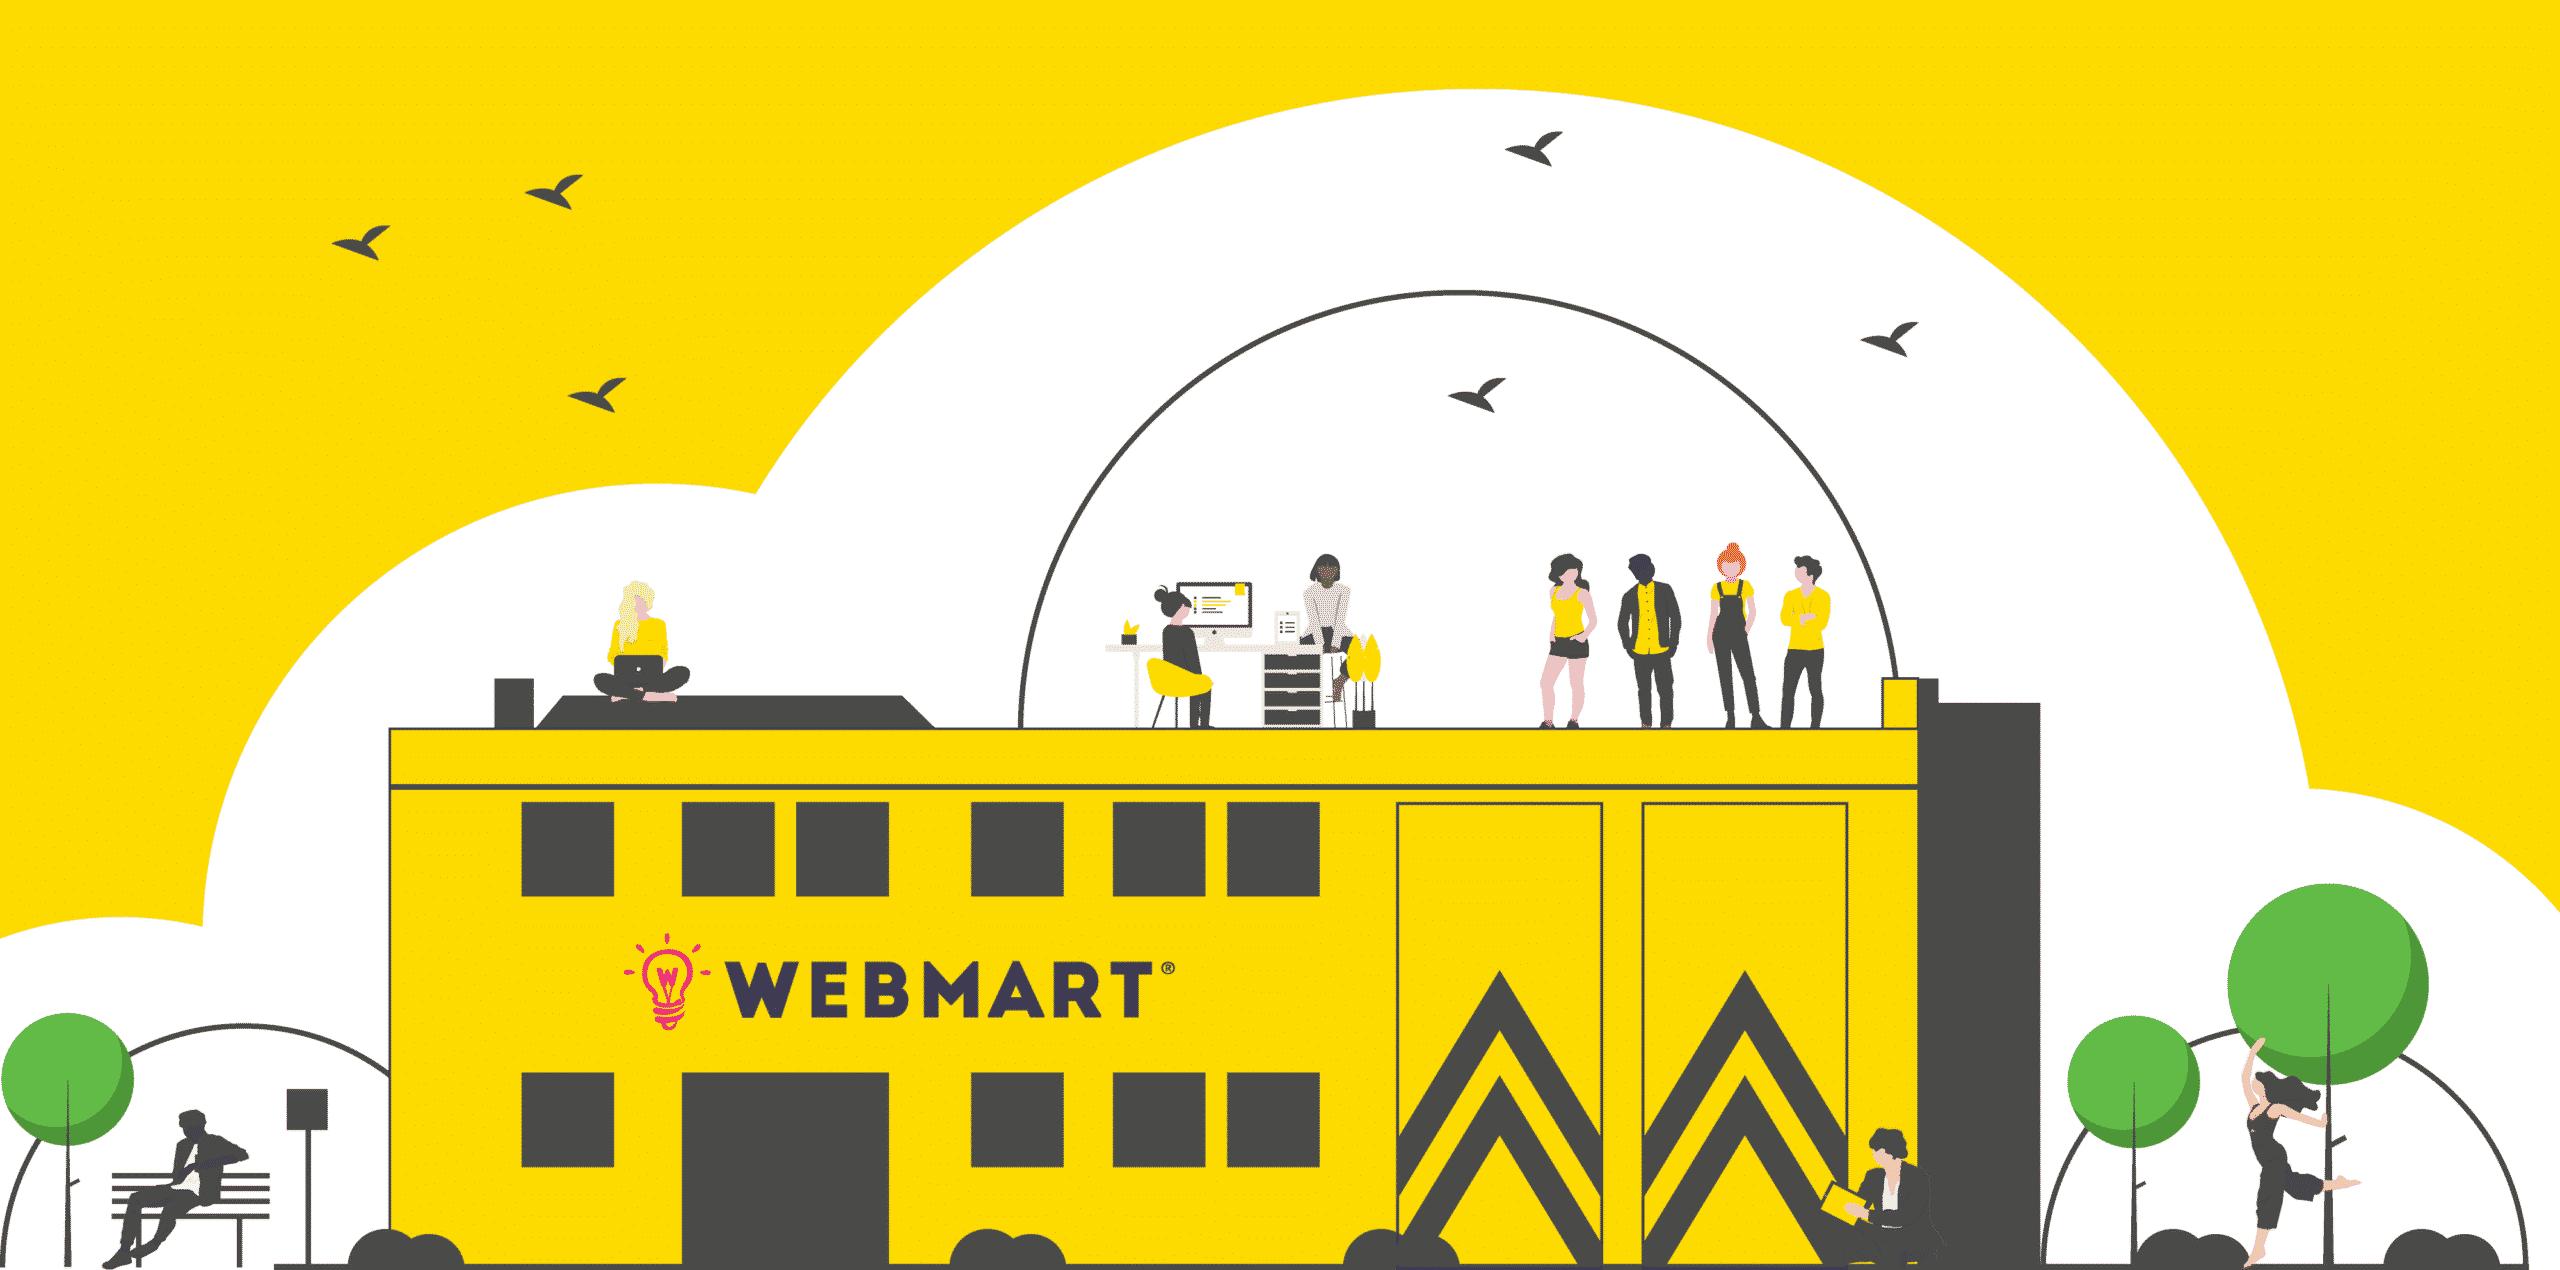 Webmart Yellow Shed of Wonderment